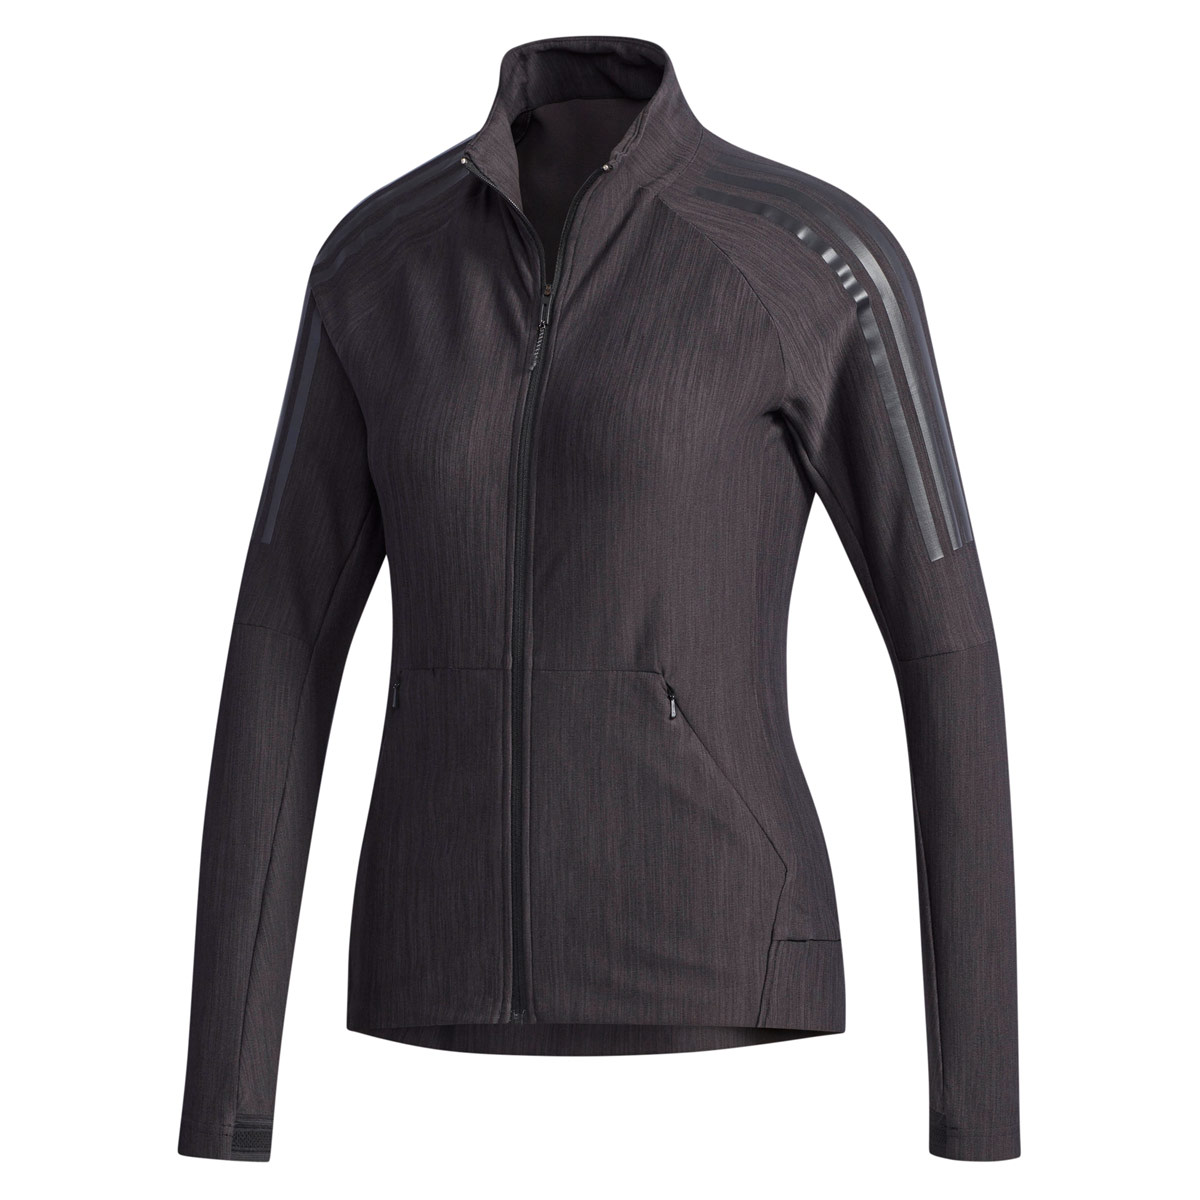 adidas Climalite Jacke - Laufjacken für Damen - Grau